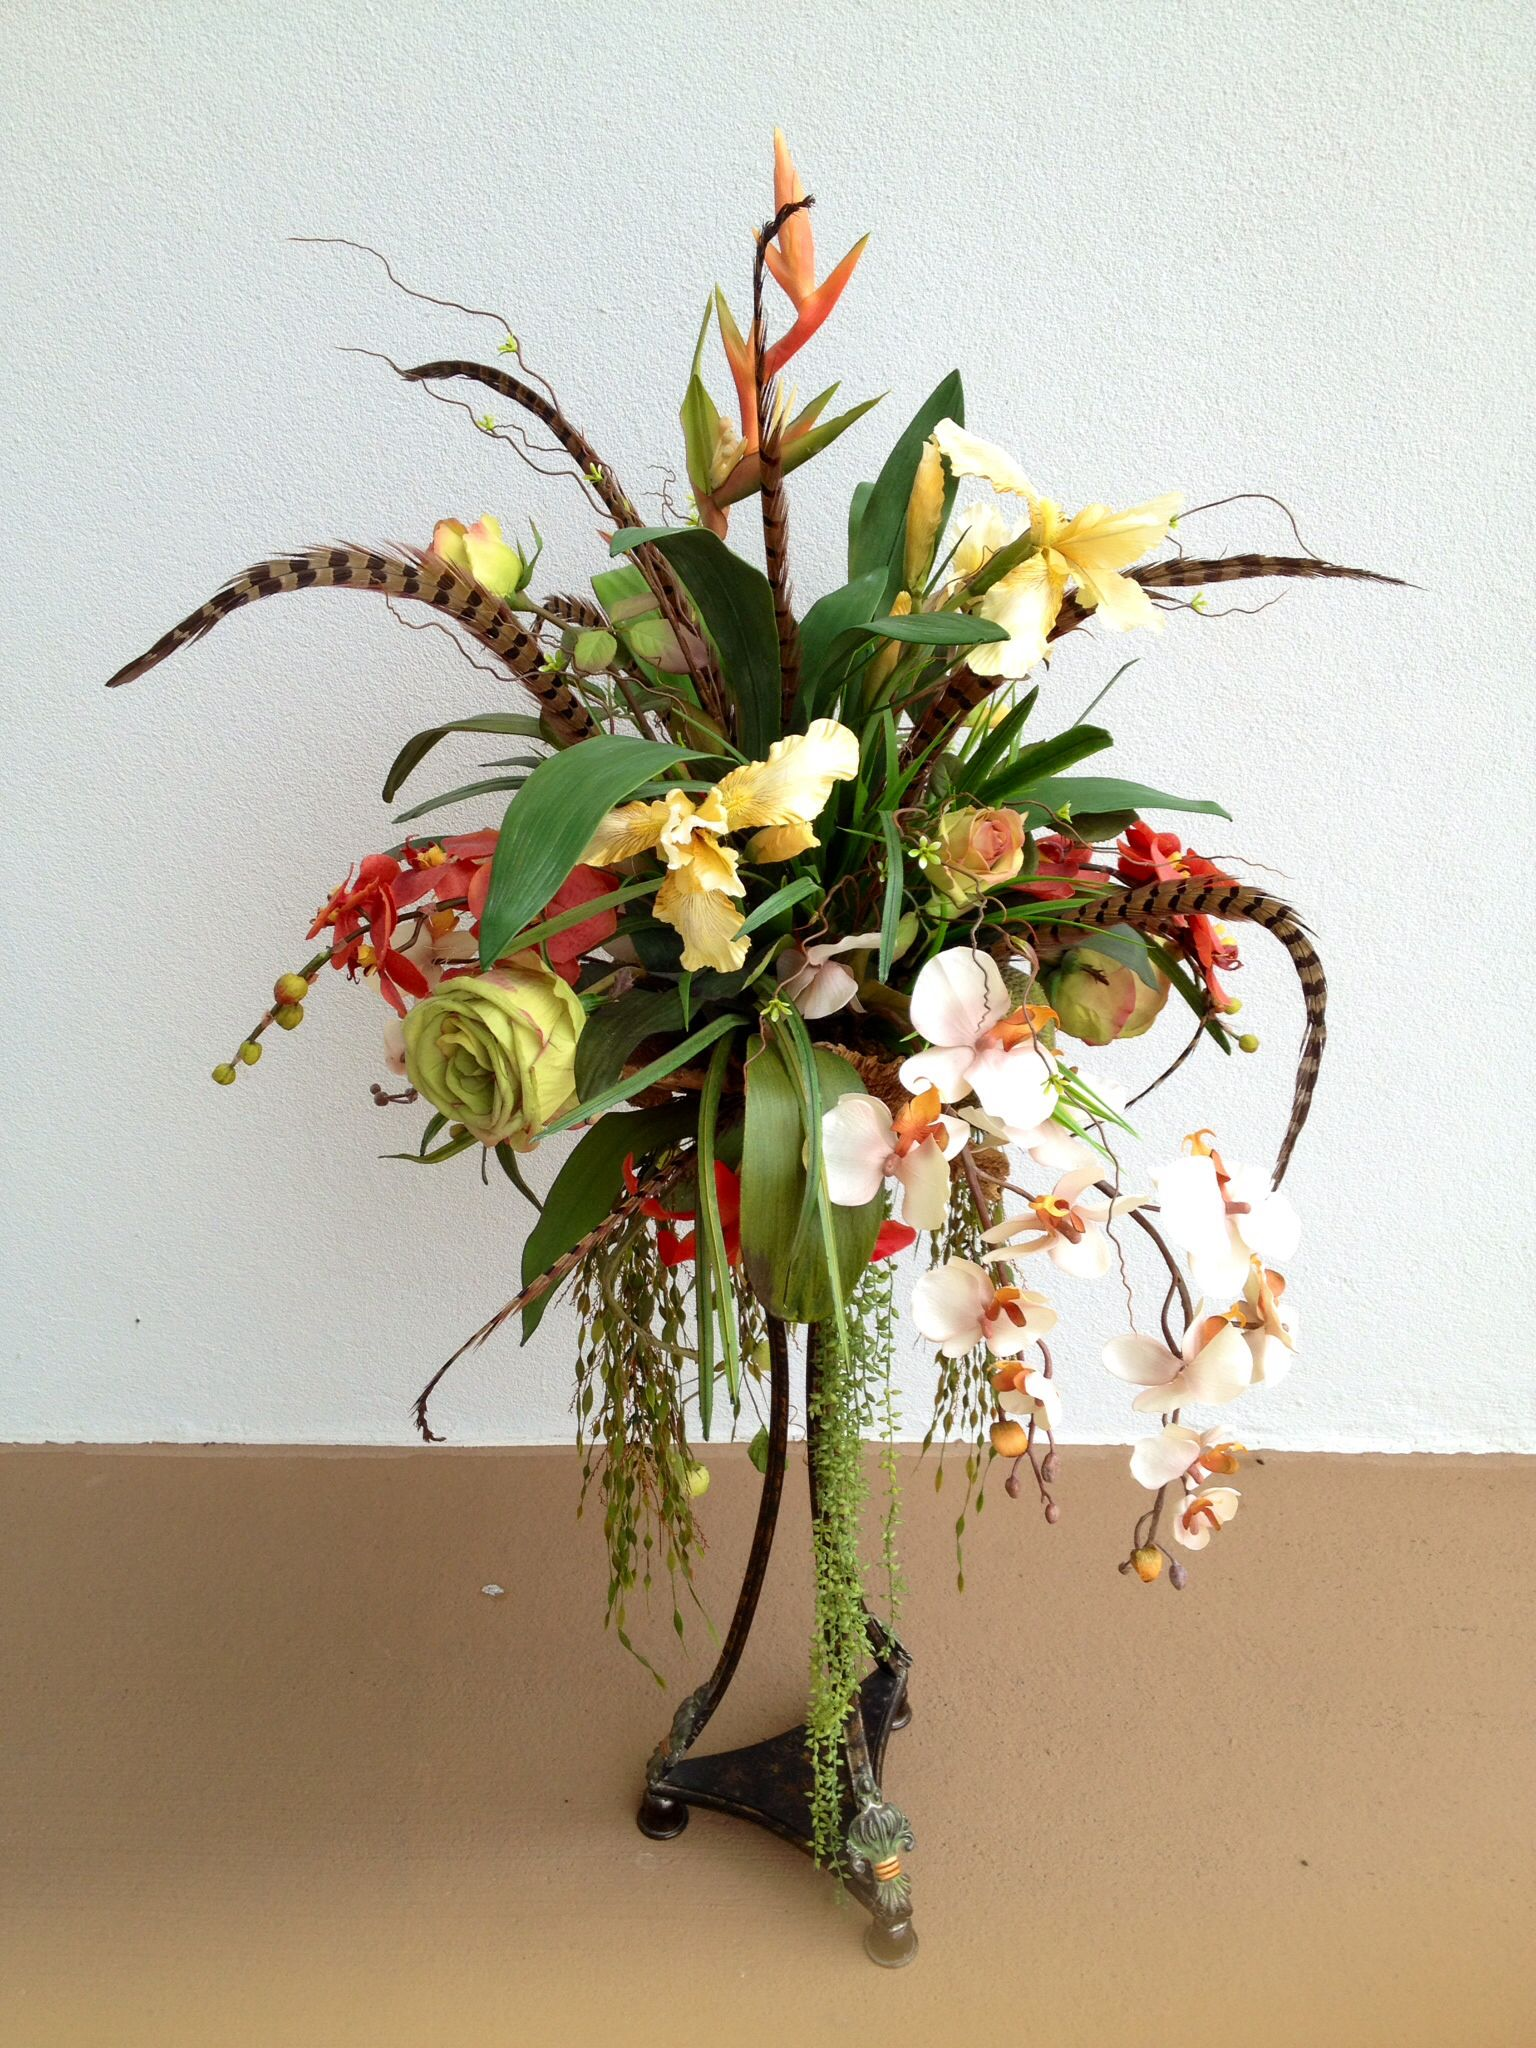 Silk Arrangements For Home Decor artificial silk flower arrangements artificial trees rtfact claygate surrey Decor